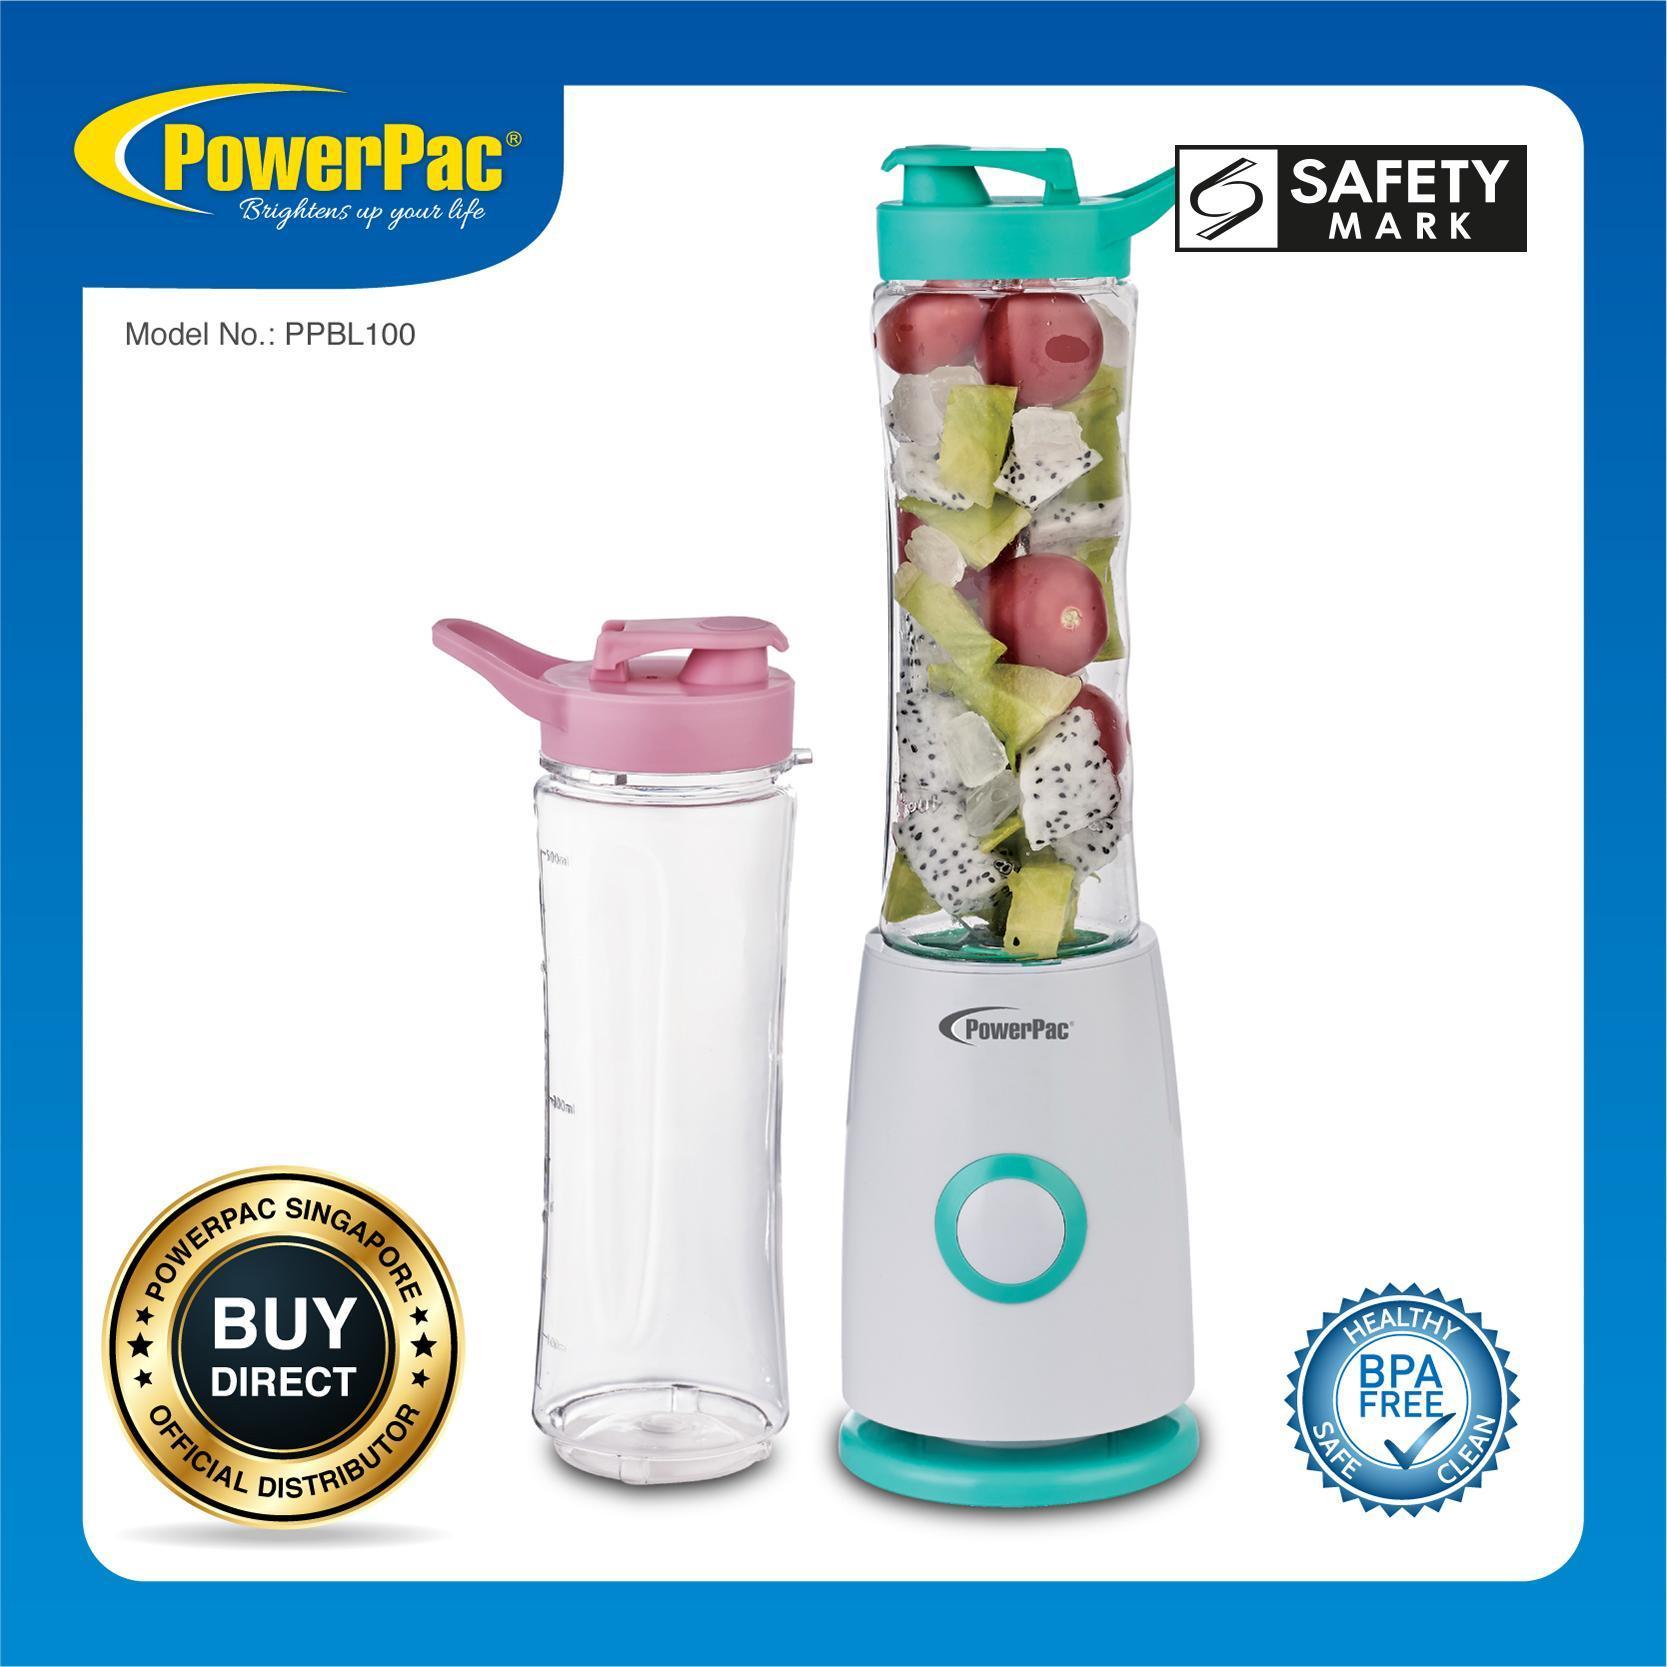 Powerpac Personal Juice Blender With 2x Bpa Free Jugs (ppbl100) By Powerpac.